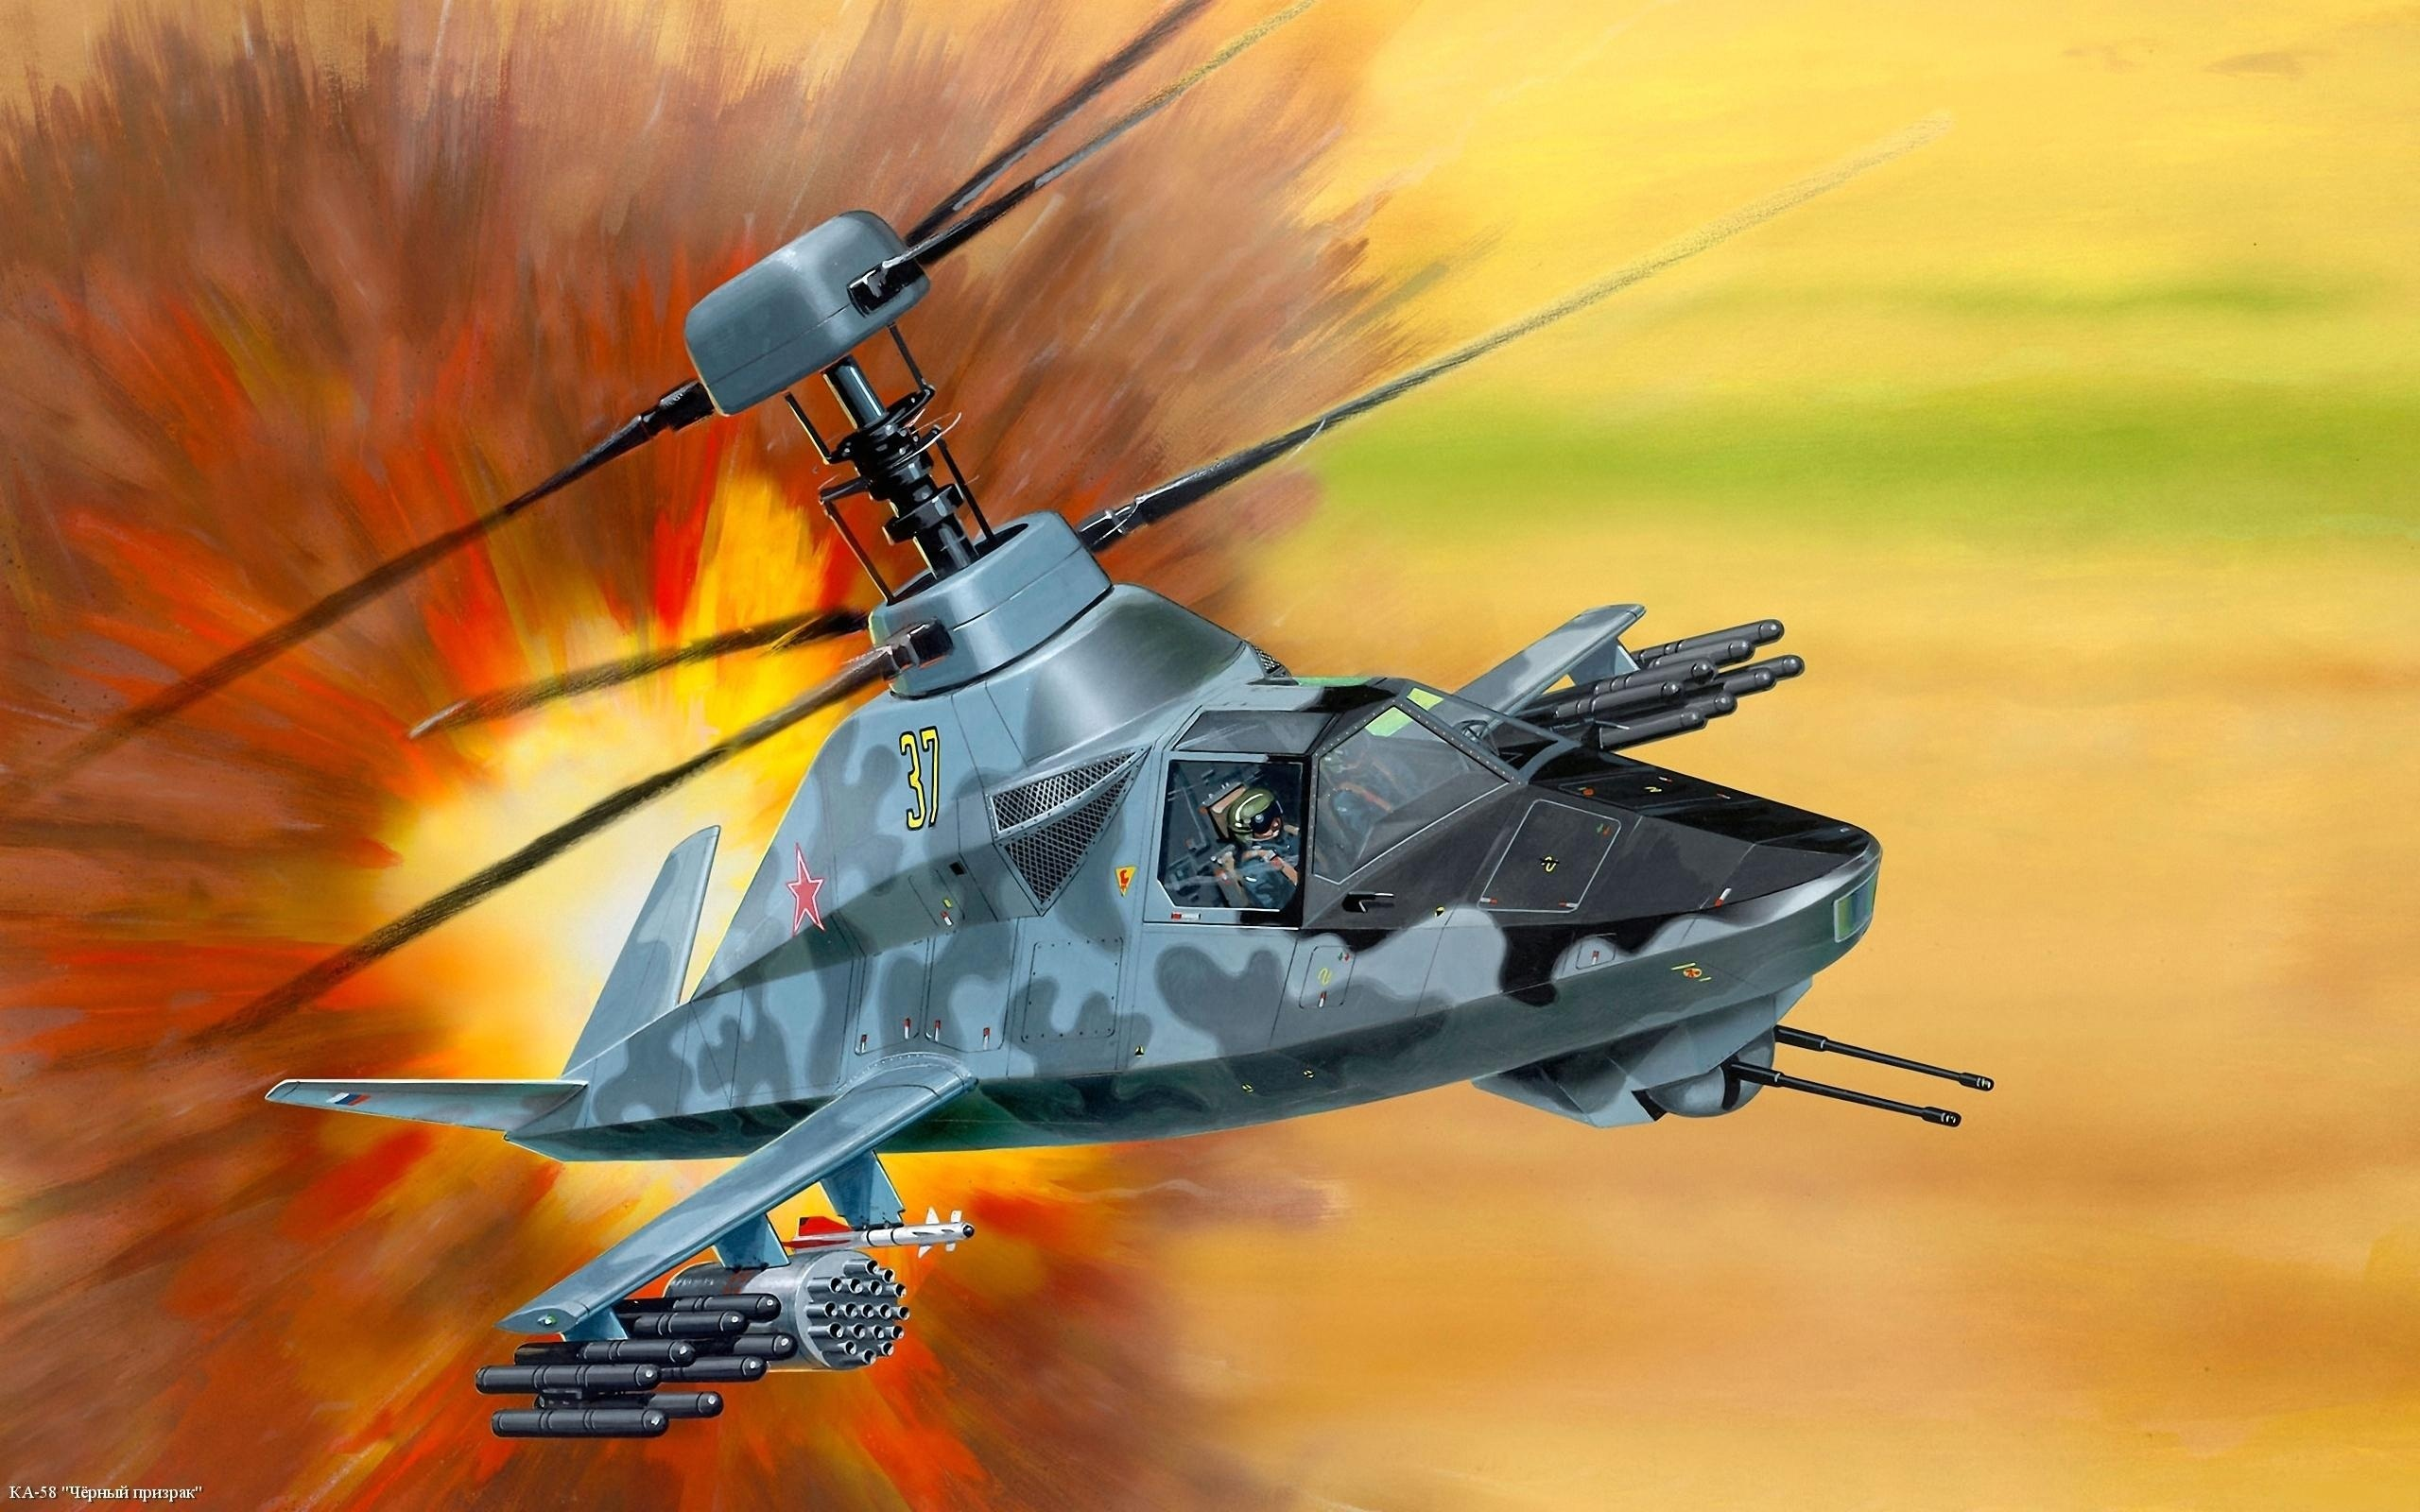 Helicopter Full Hd Wallpaper Ka 58 Stealth Helicopter Full Hd Wallpaper And Background